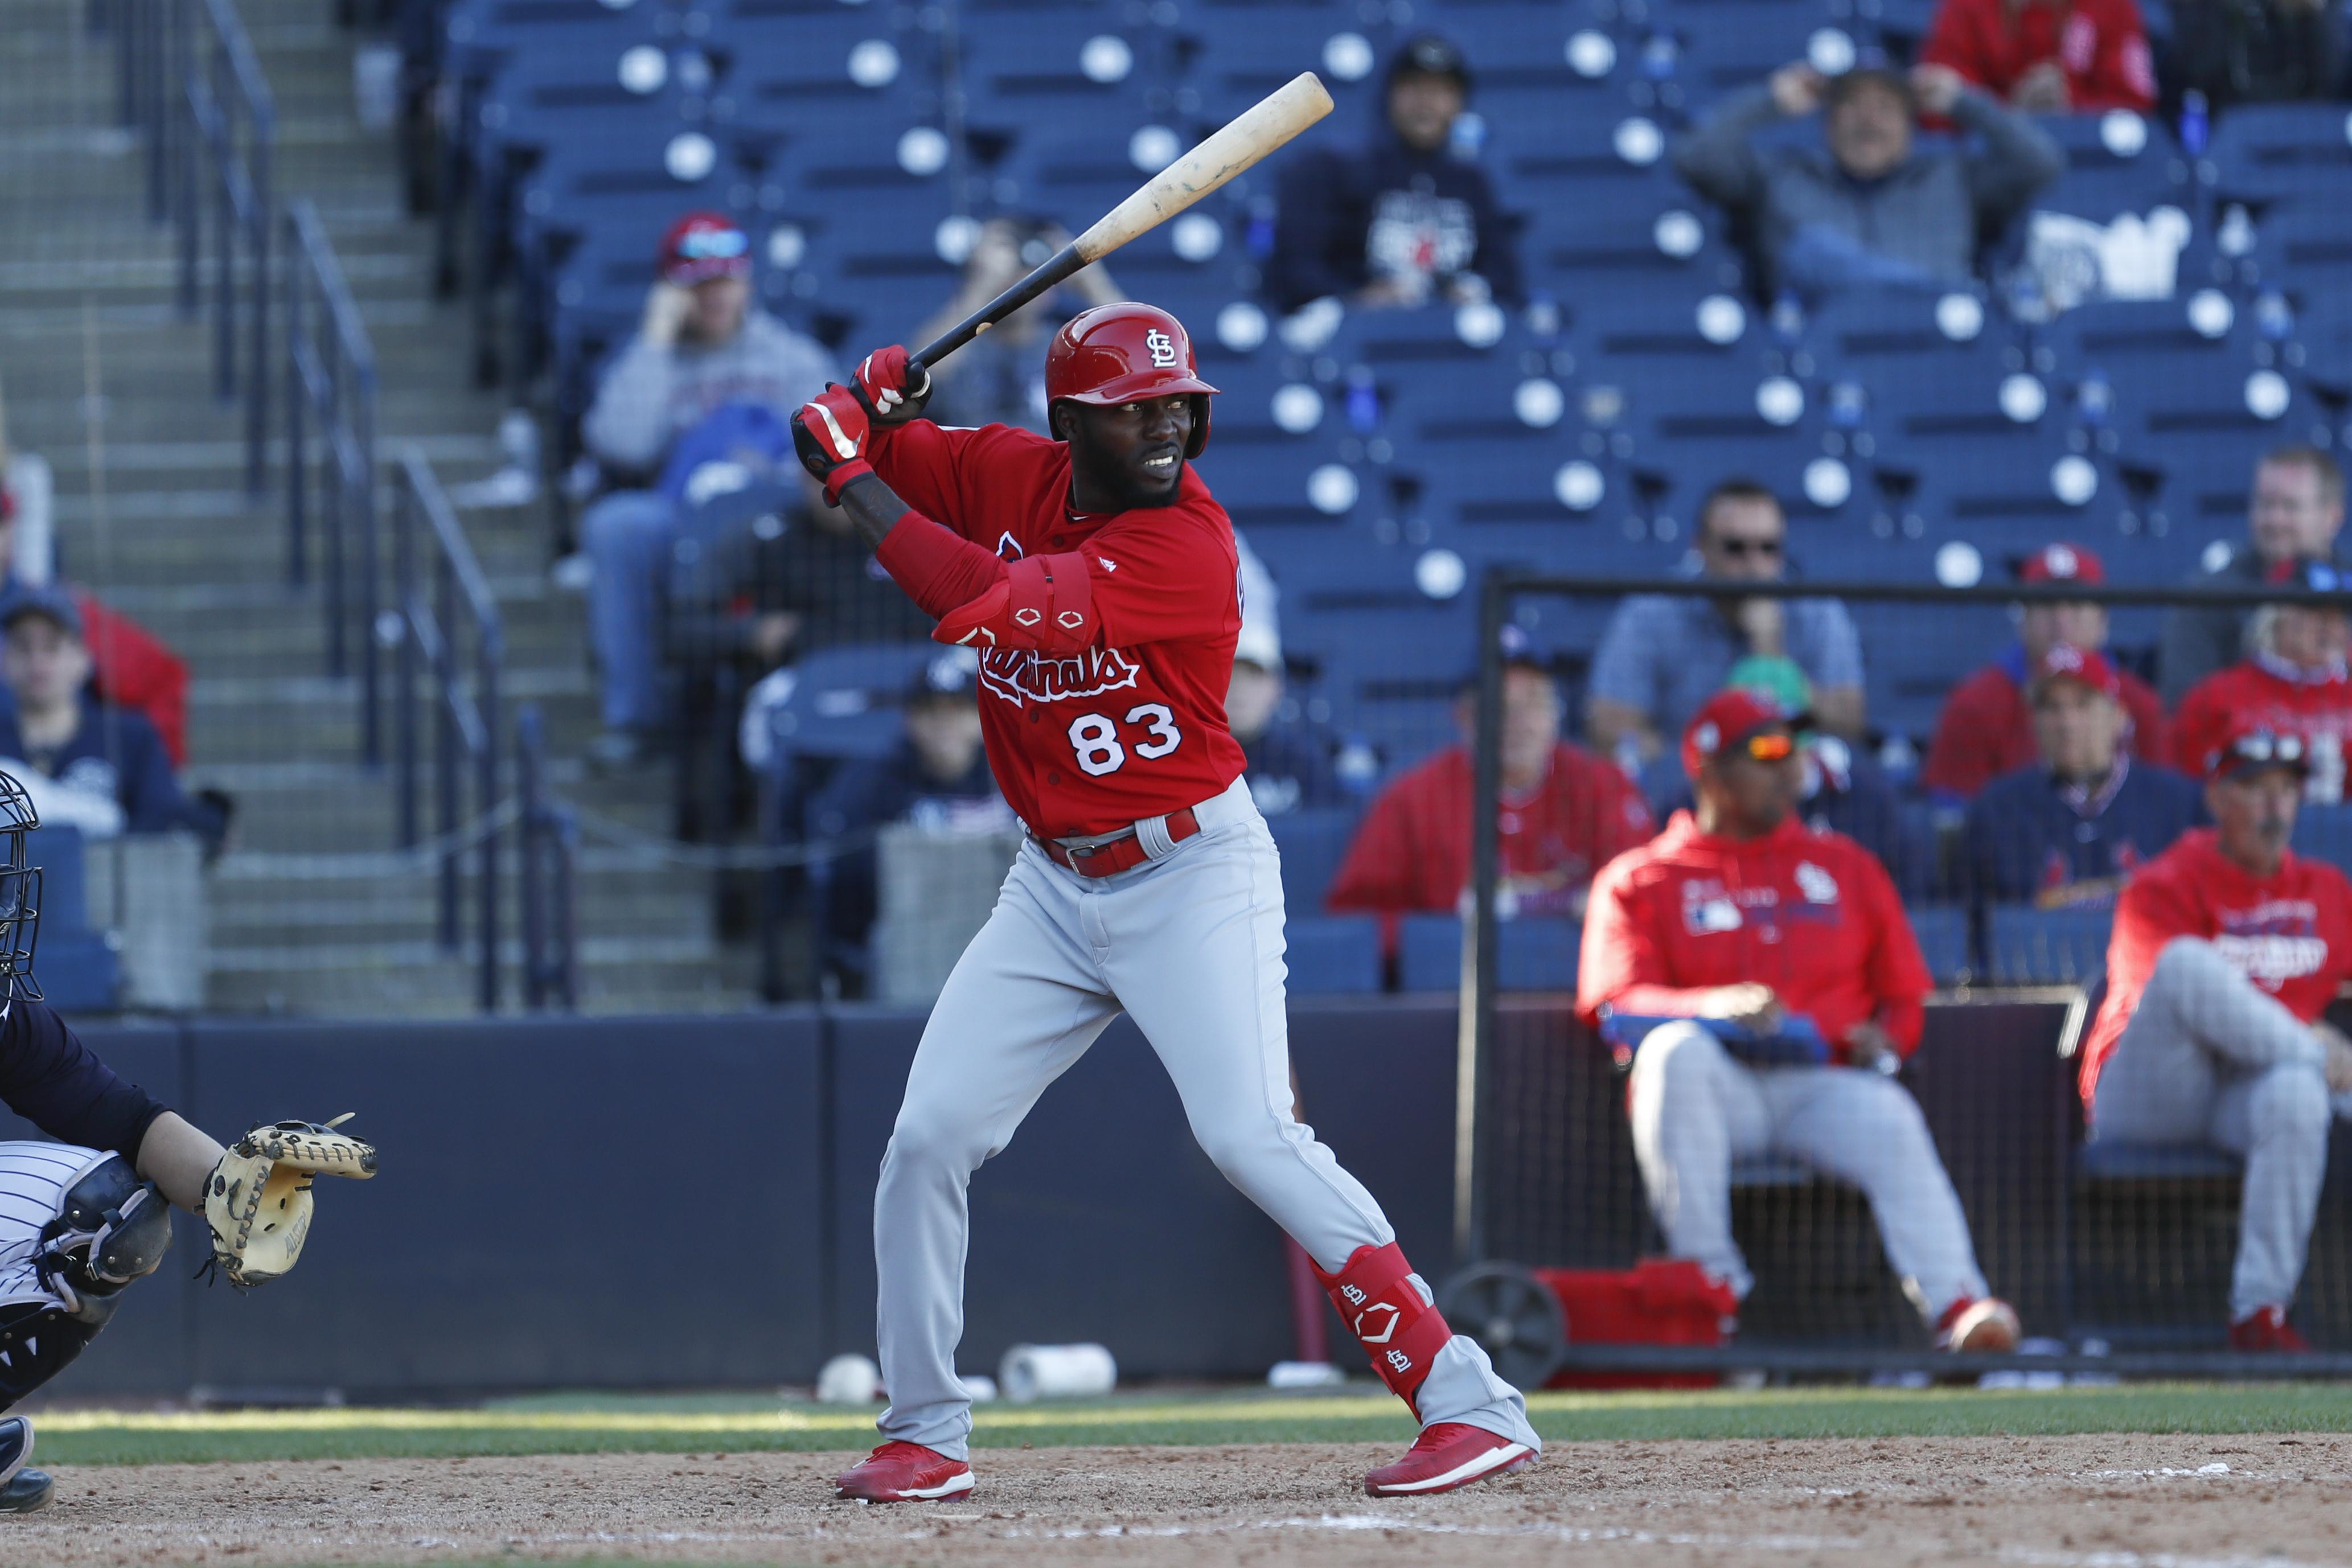 MLB:3月6日春季训练 - 在洋基队的红衣主教